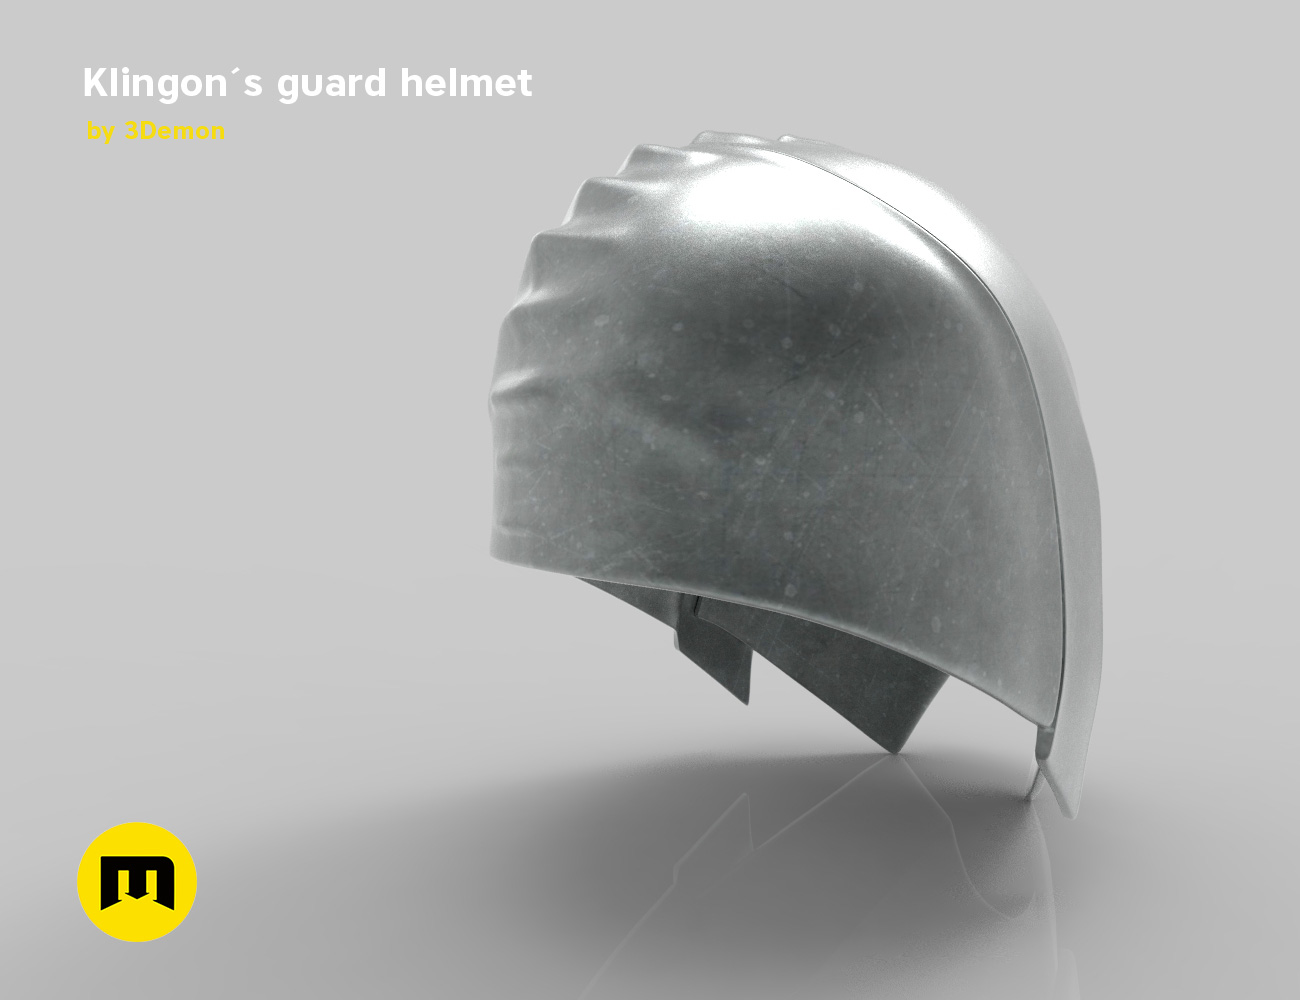 render_klingon_color.50.jpg Download STL file Klingon guard helmet • 3D printer object, 3D-mon